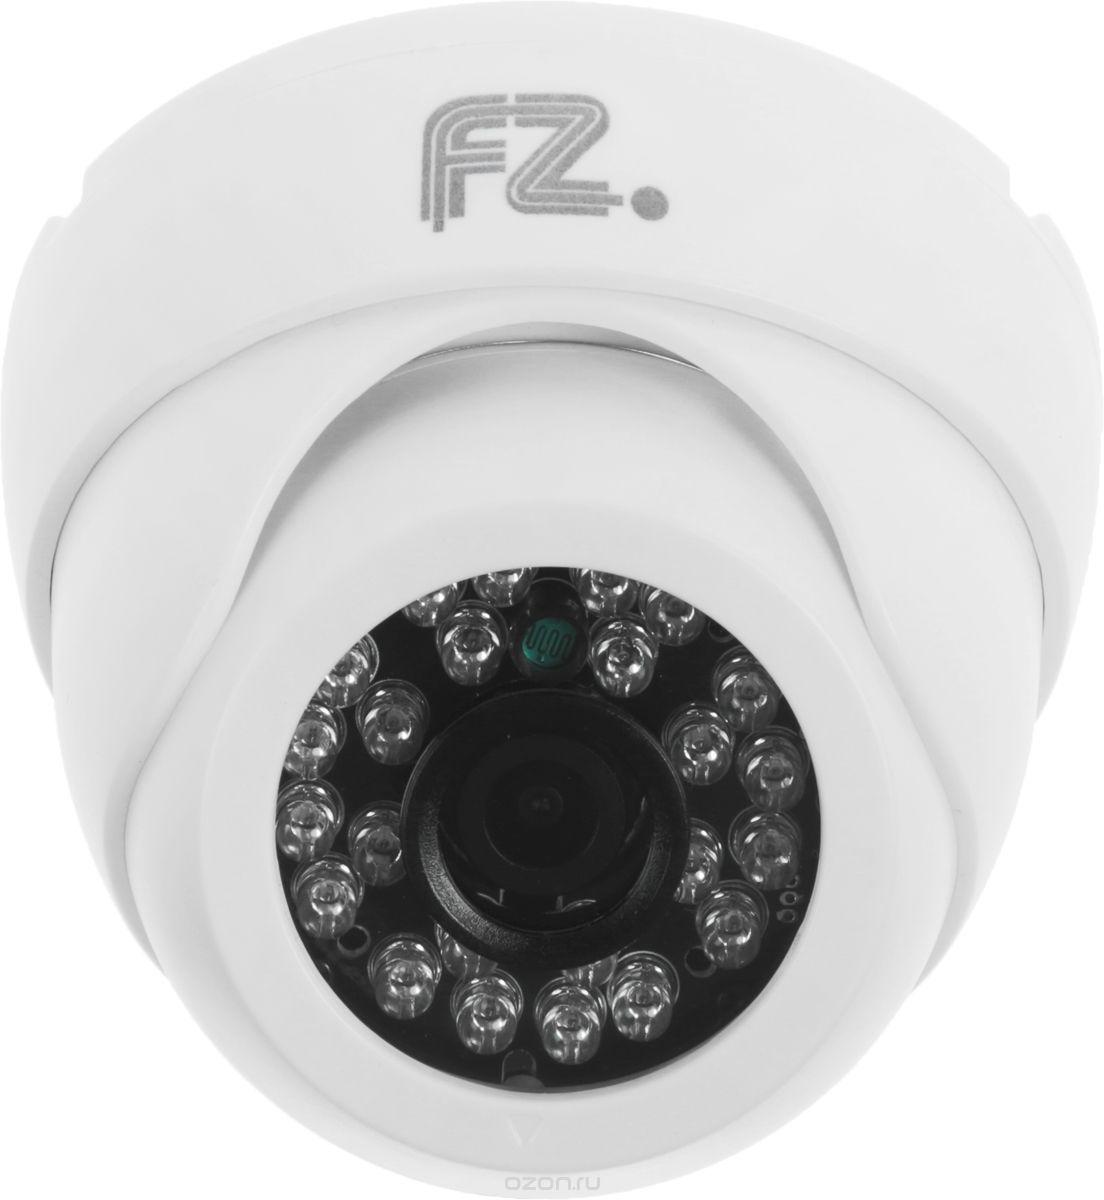 Fazera FZ-DIRP24-1080, White камера видеонаблюдения fazera fz 04n01 сетевой видеорегистратор